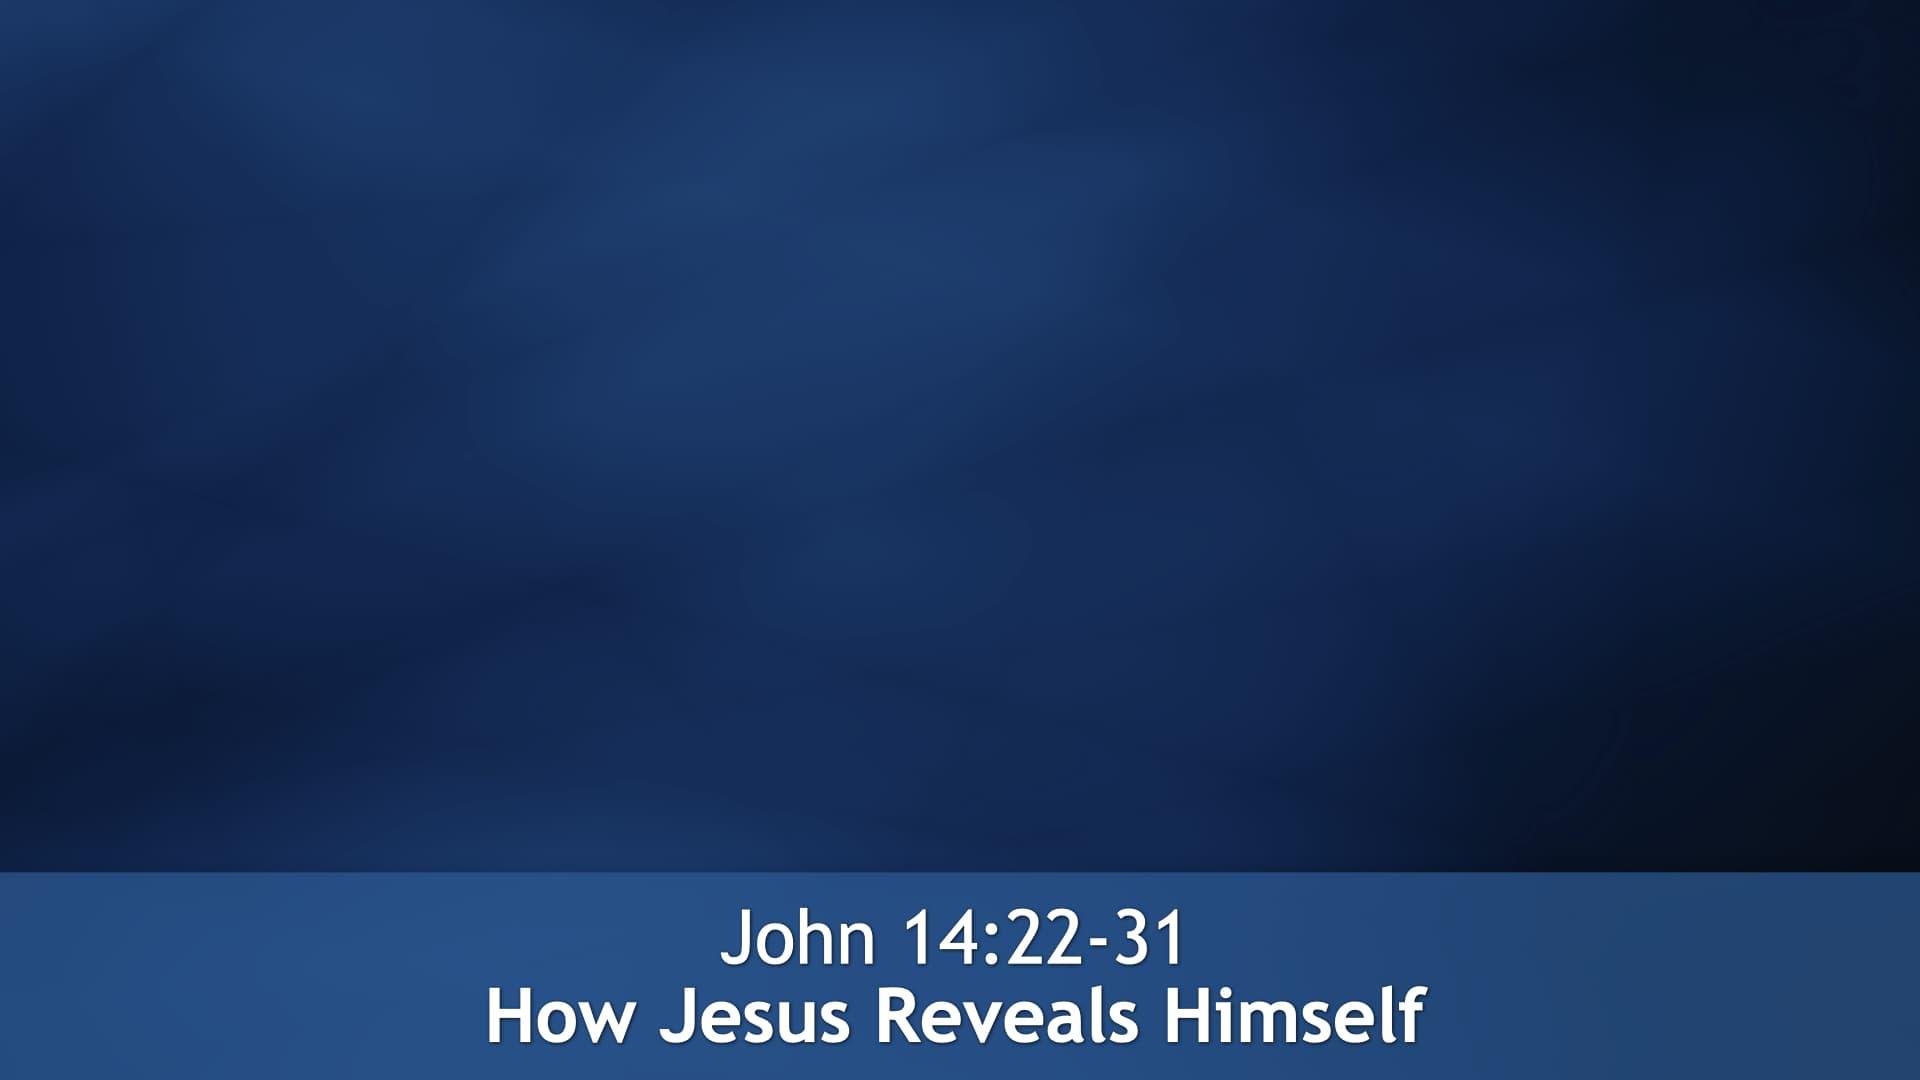 John 14:22-31, How Jesus Reveals Himself